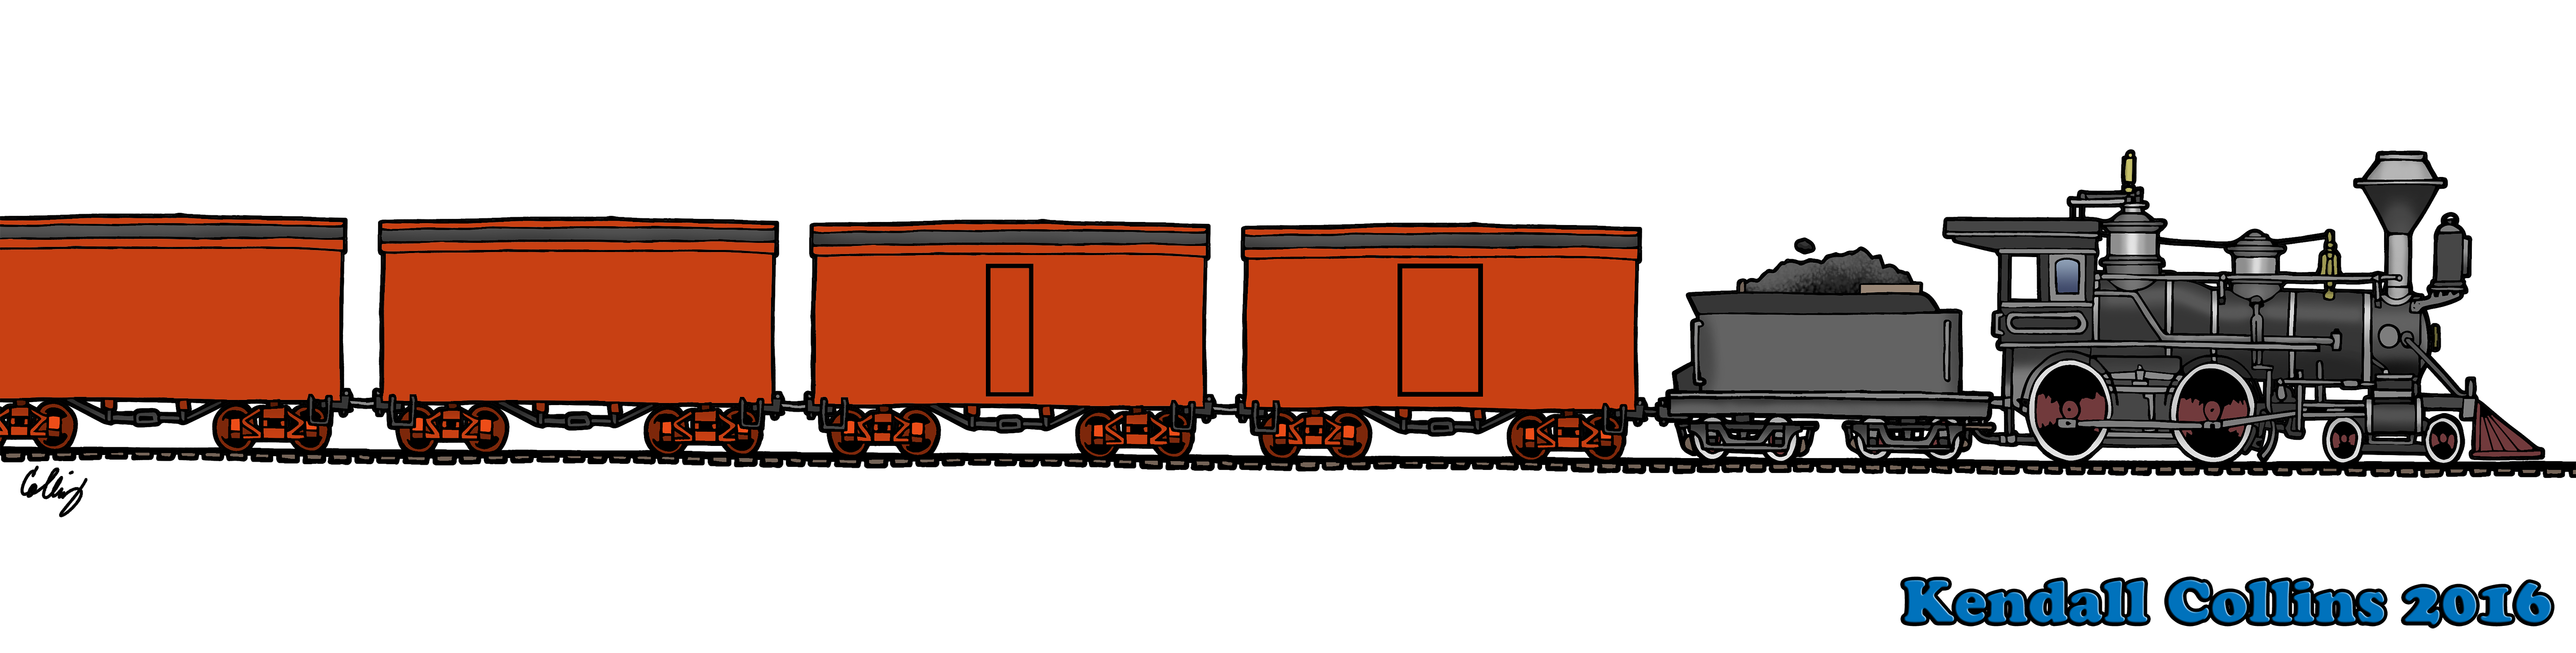 Cargo train clipart vector royalty free library Freight train clipart clipart images gallery for free download ... vector royalty free library